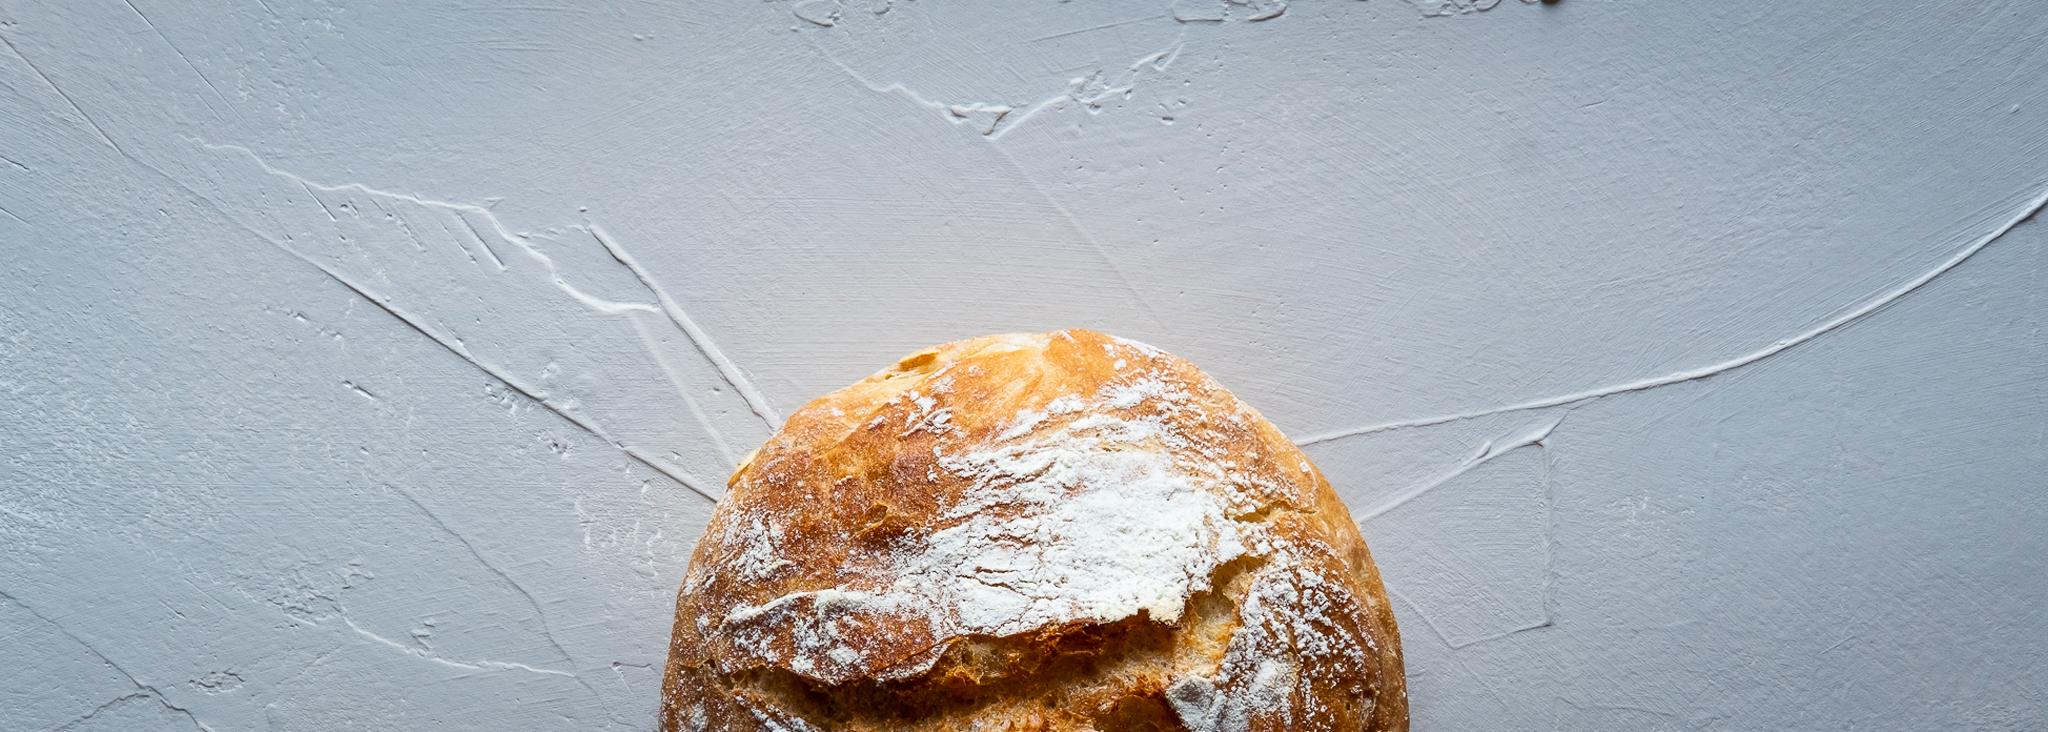 Gabriele Capelli Fotografo Food